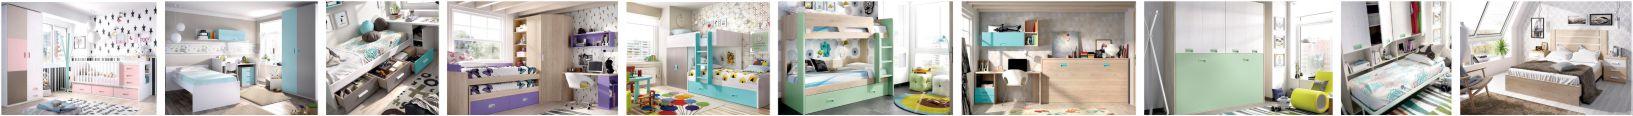 Jaunuolio kambario baldai miegamojo kambariui